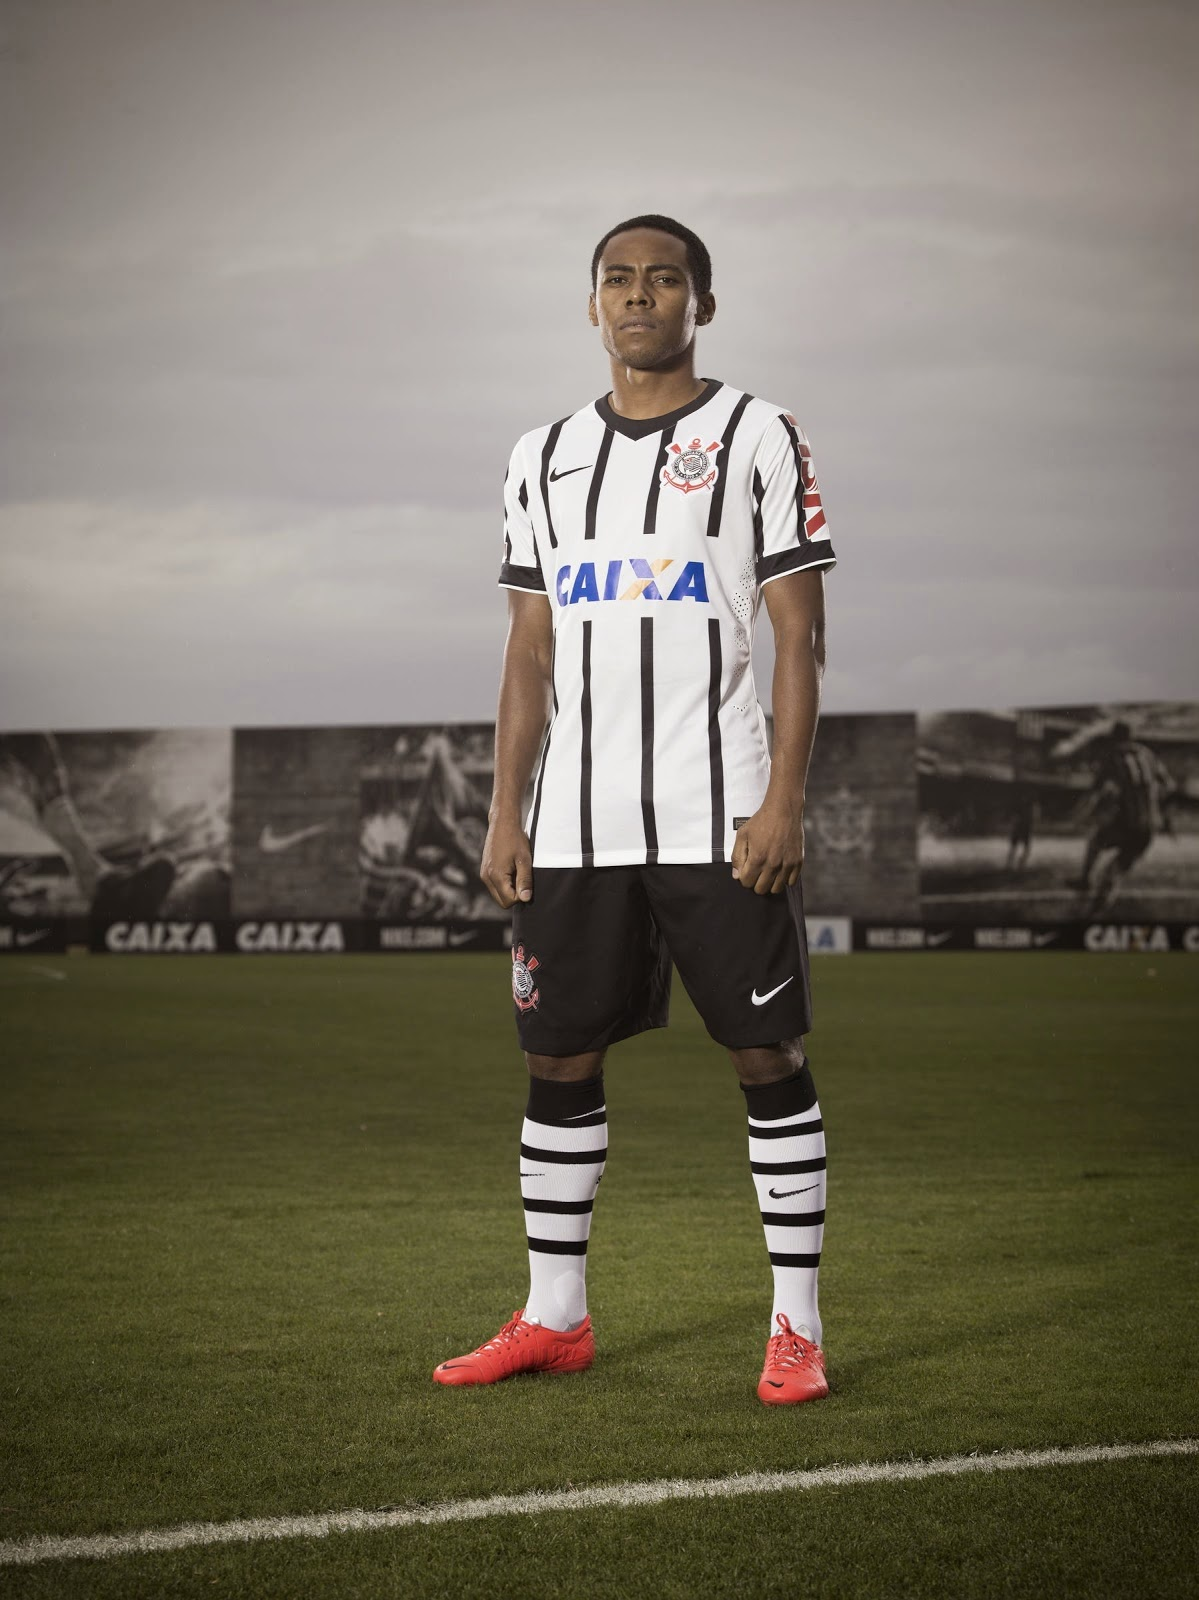 http://4.bp.blogspot.com/-JPVjySvM_44/U9PTx9dTbqI/AAAAAAAAKLs/q6RCONWTcmM/s1600/Corinthians-14-15-Home-Kit-Nike+(2).jpg